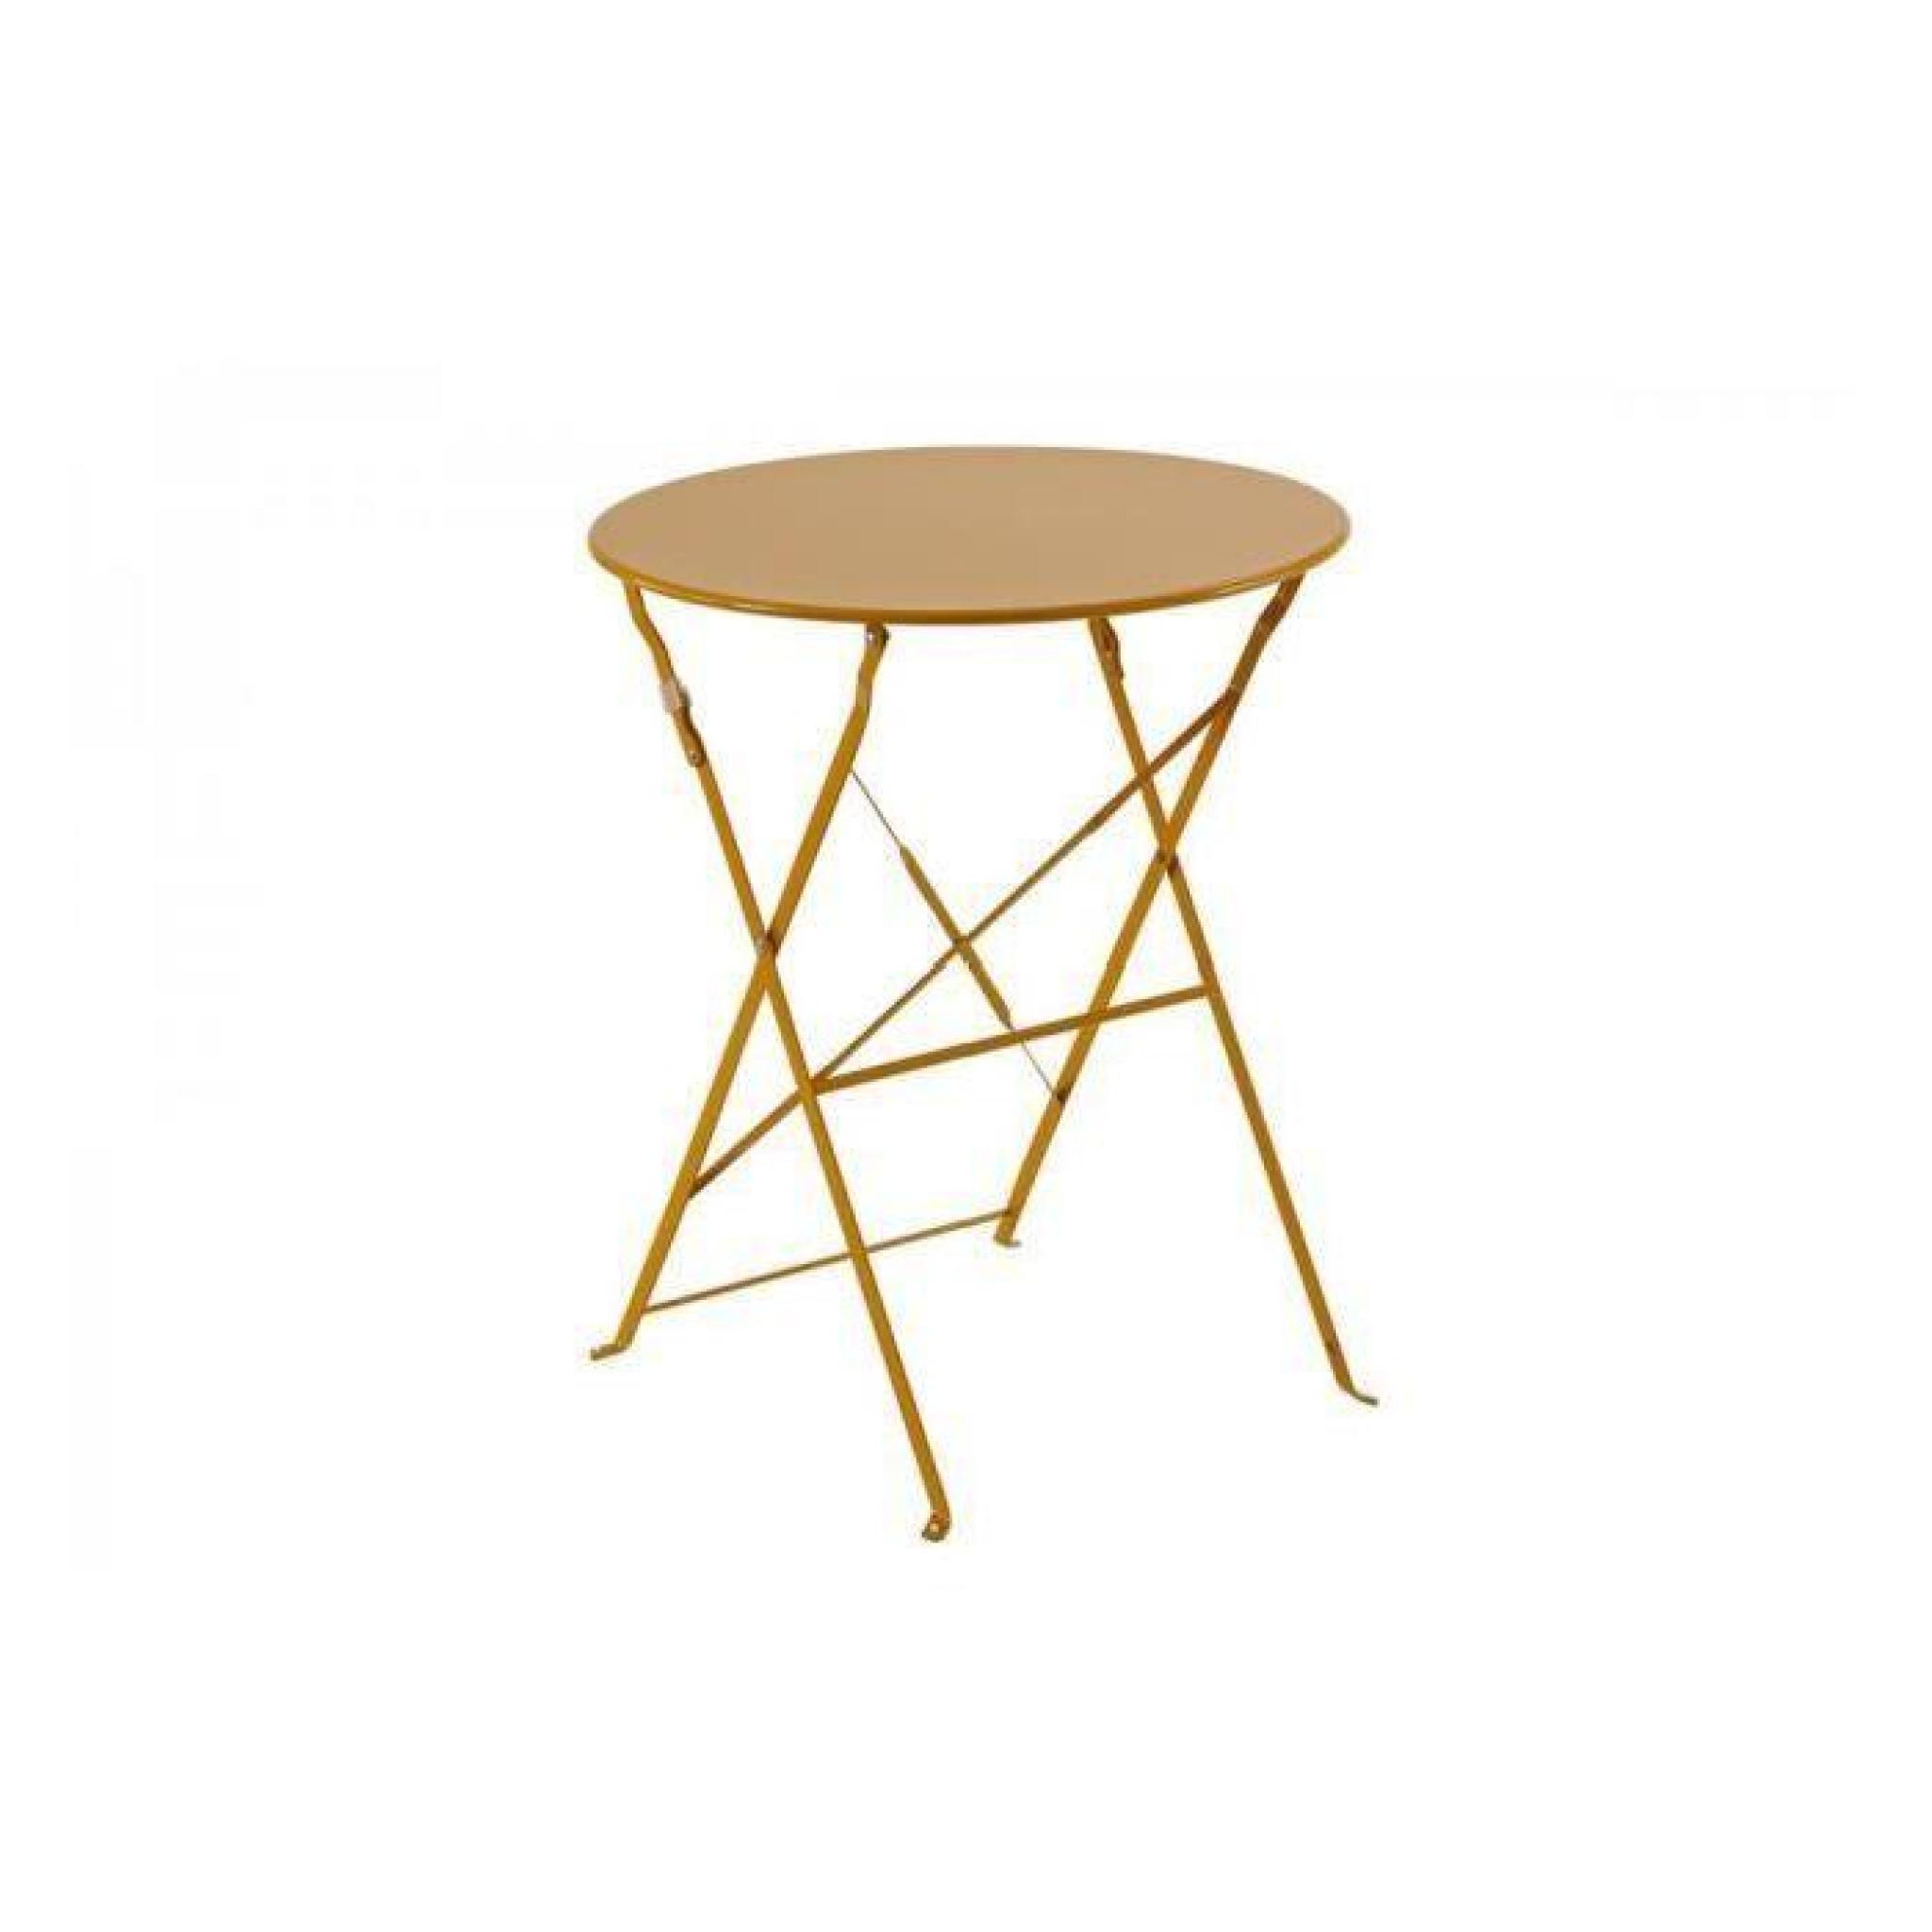 TABLE RONDE 60CM PLIANTE CAMARGUE HESPERIDE ORANGE - Achat/Vente ...